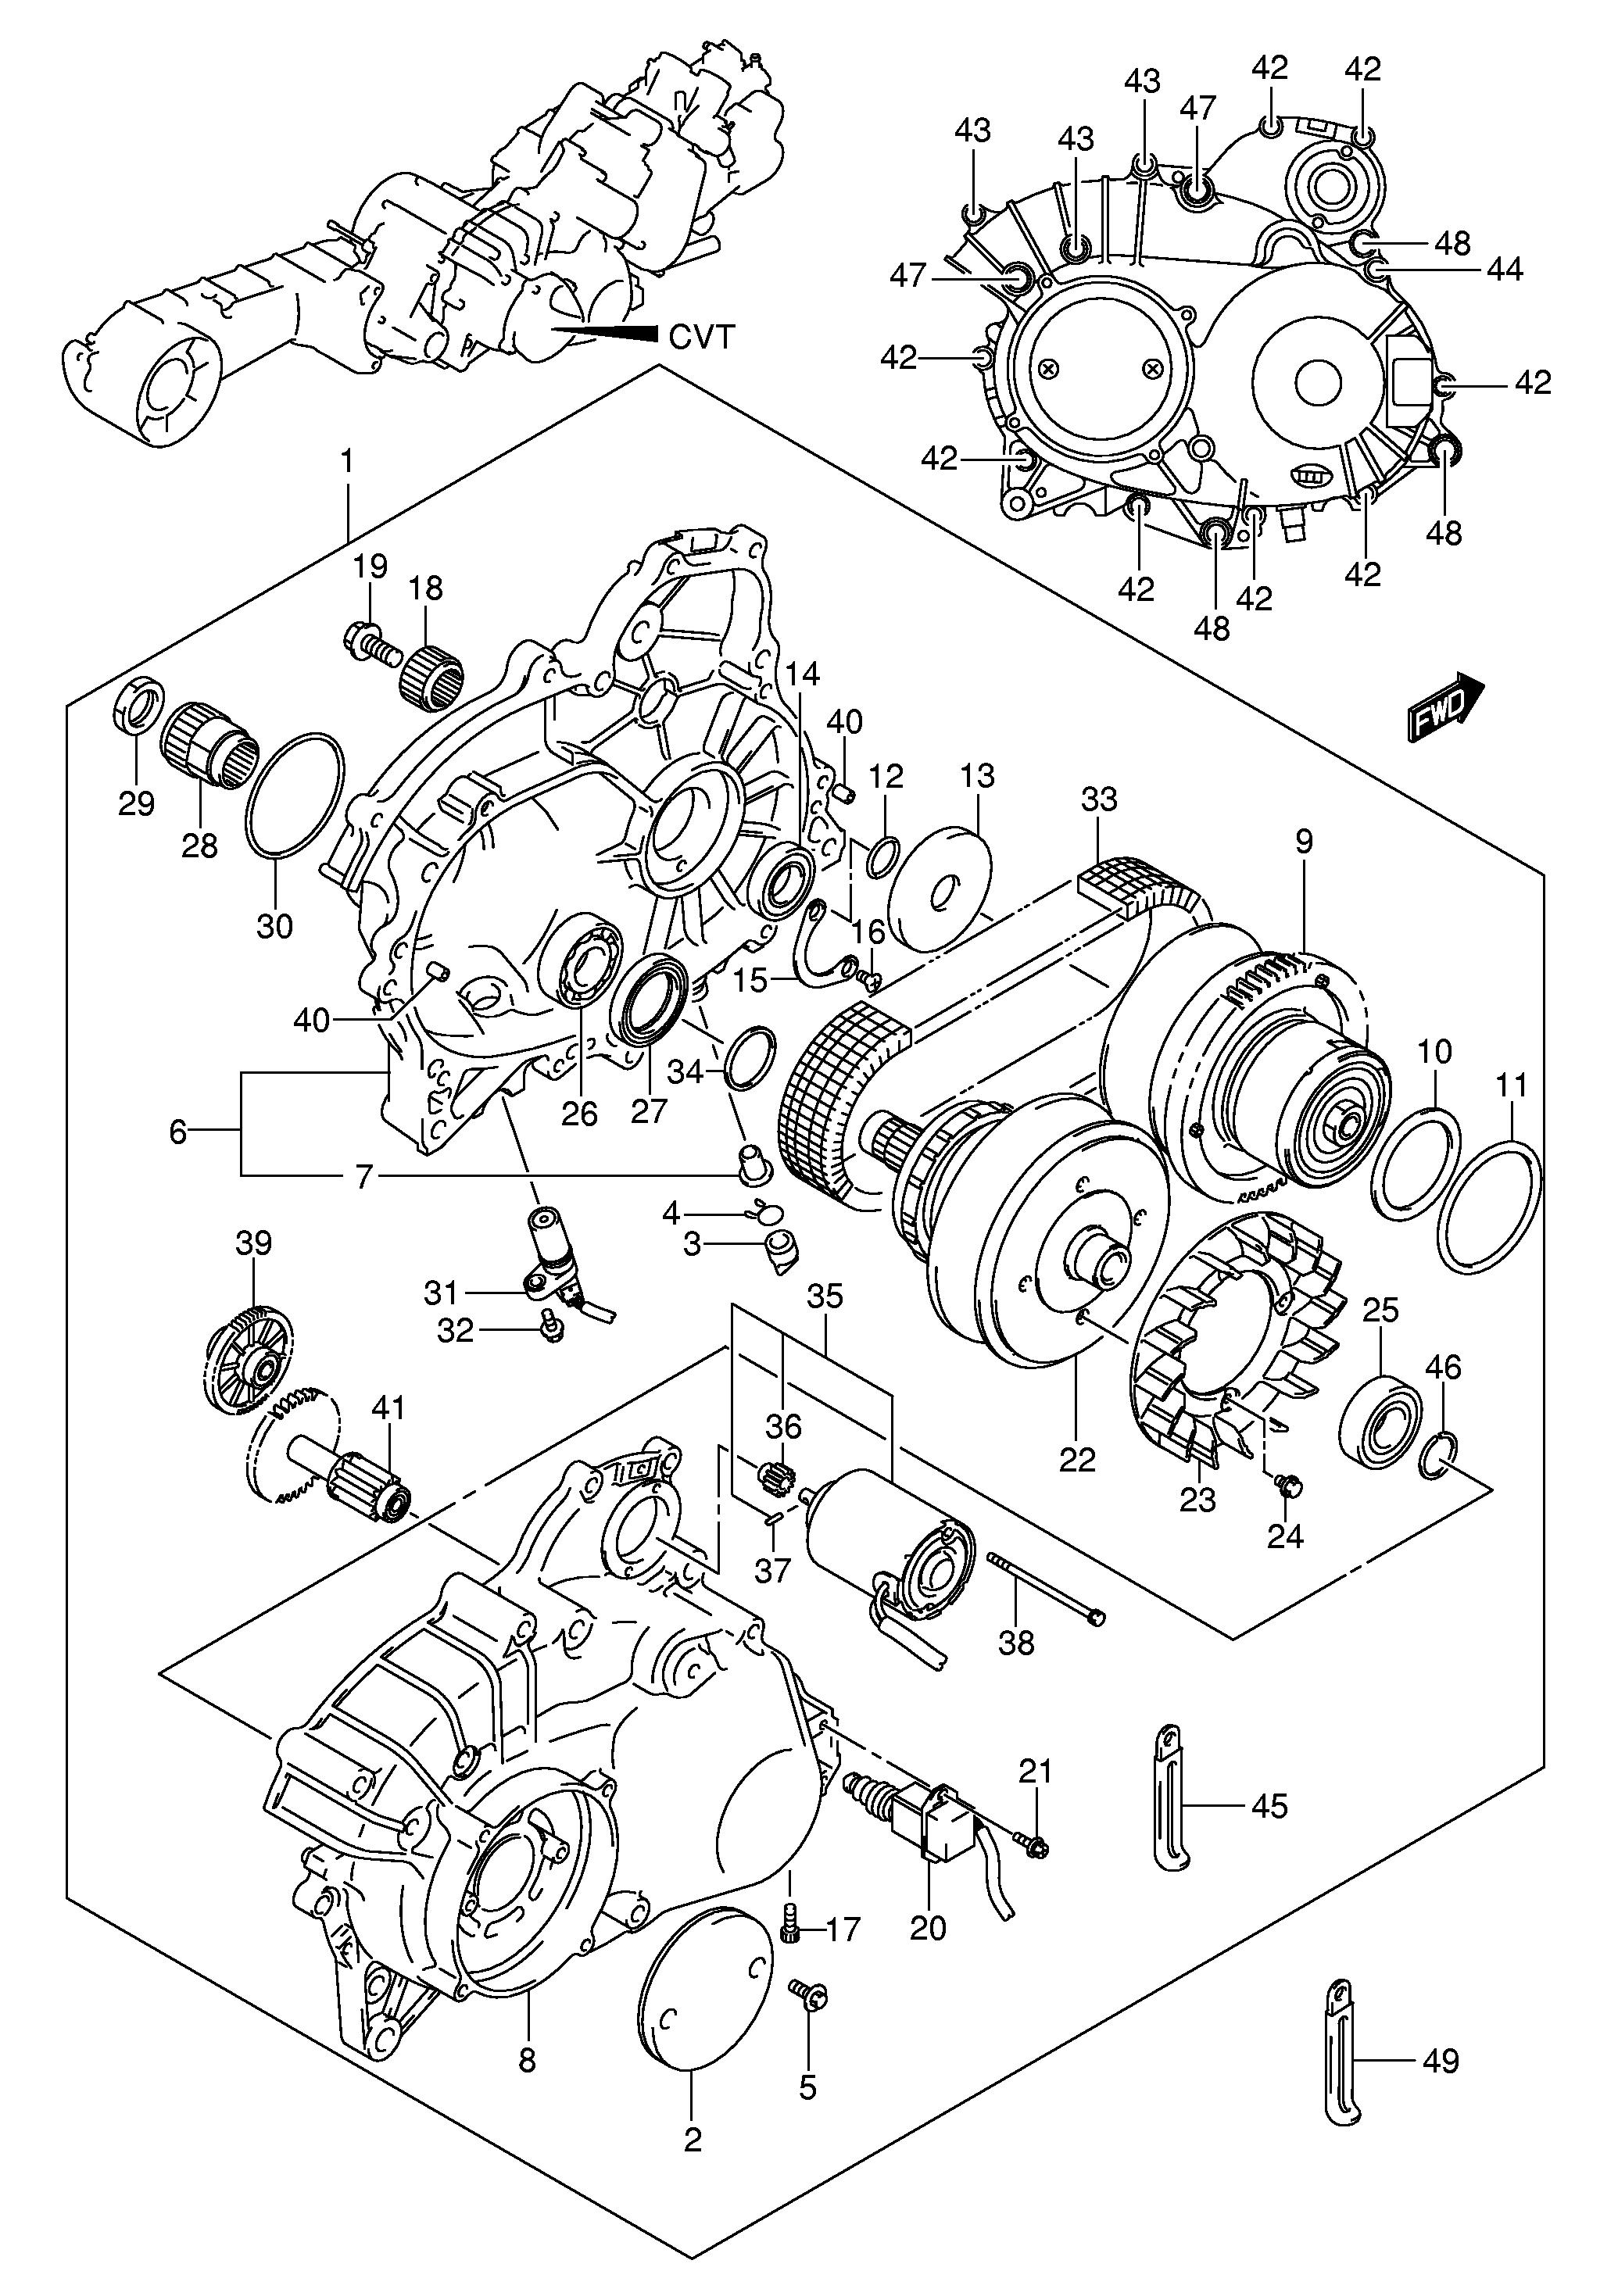 Sensor Polea Cvt Suzuki Burgman 650